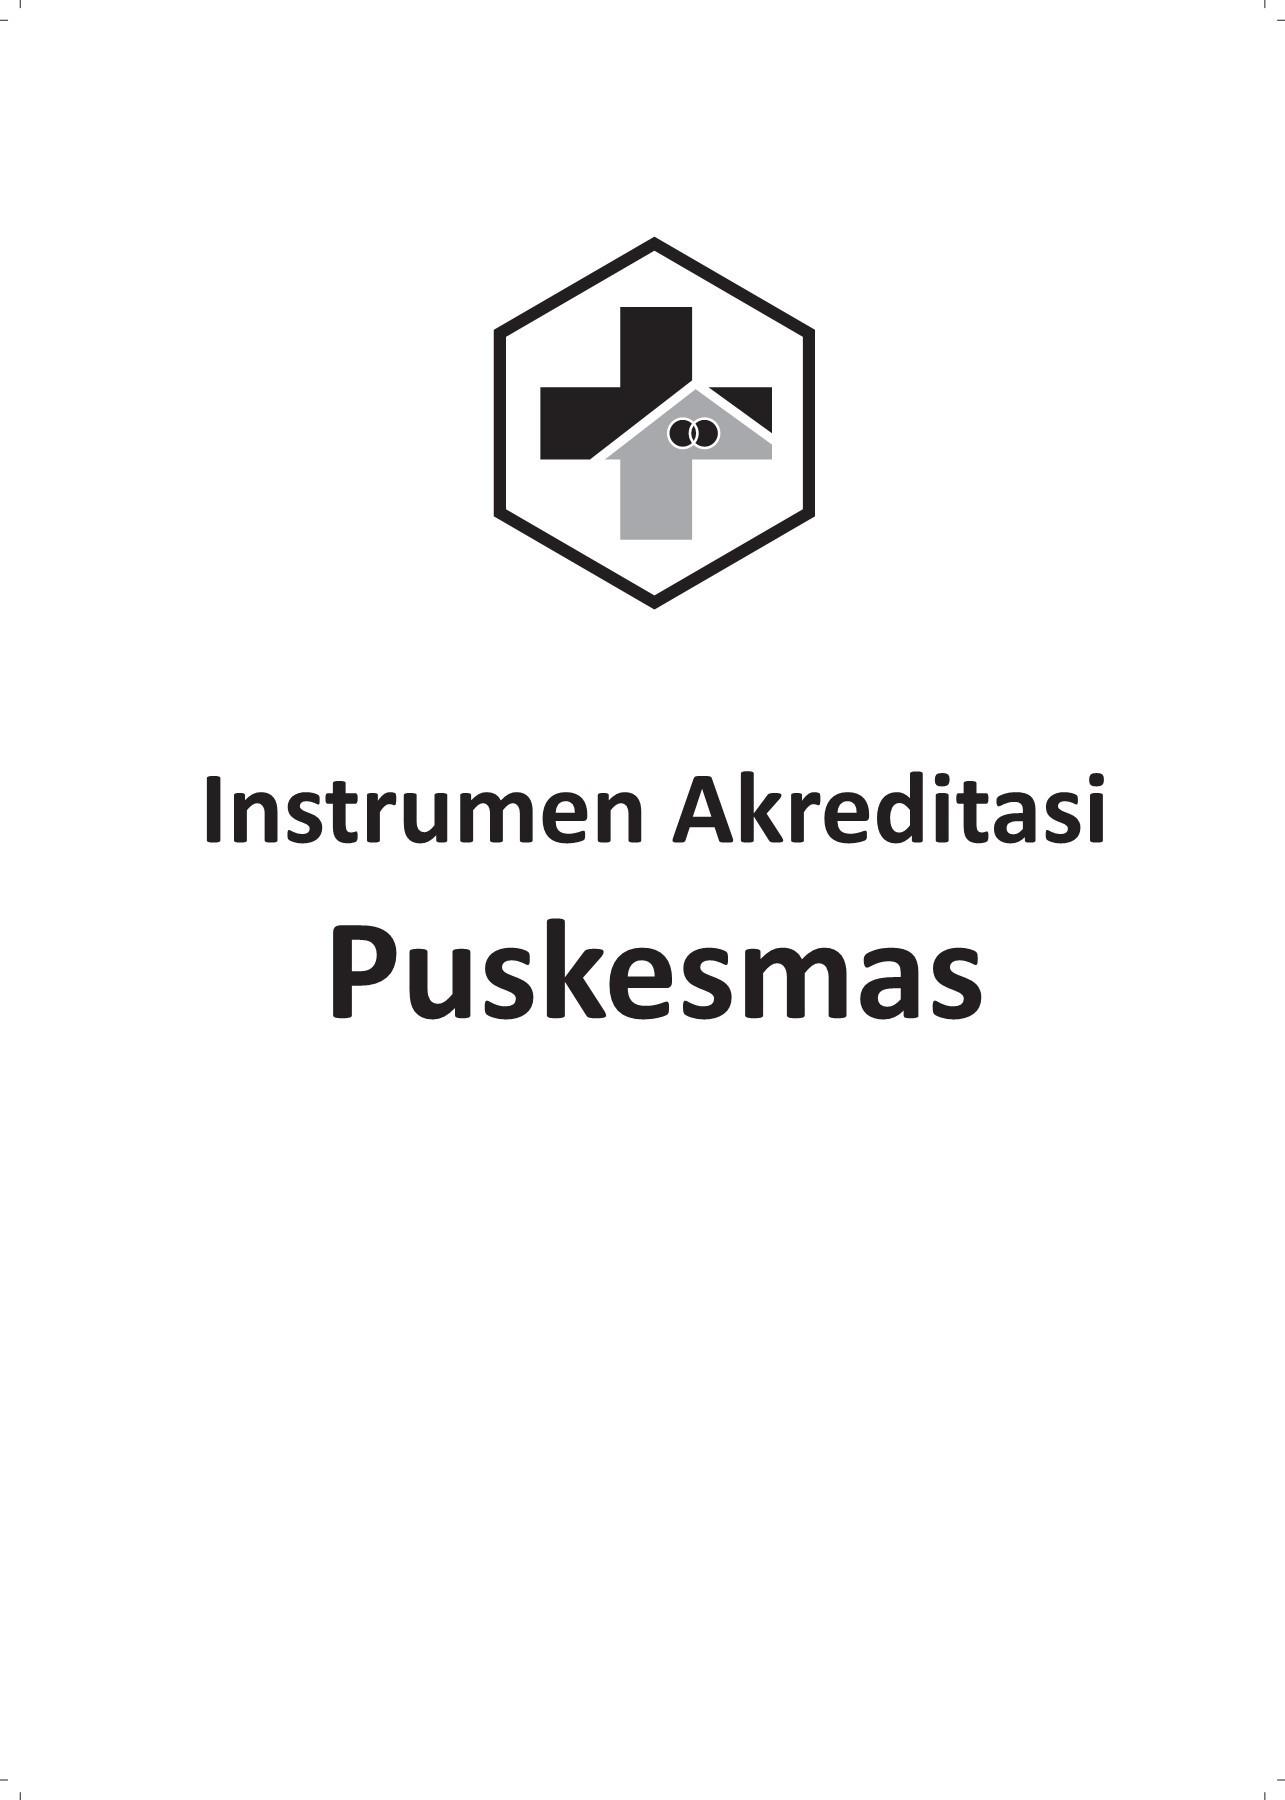 Logo Puskesmas Terbaru Permenkes No.75 Thn 2014 Vector Cdr